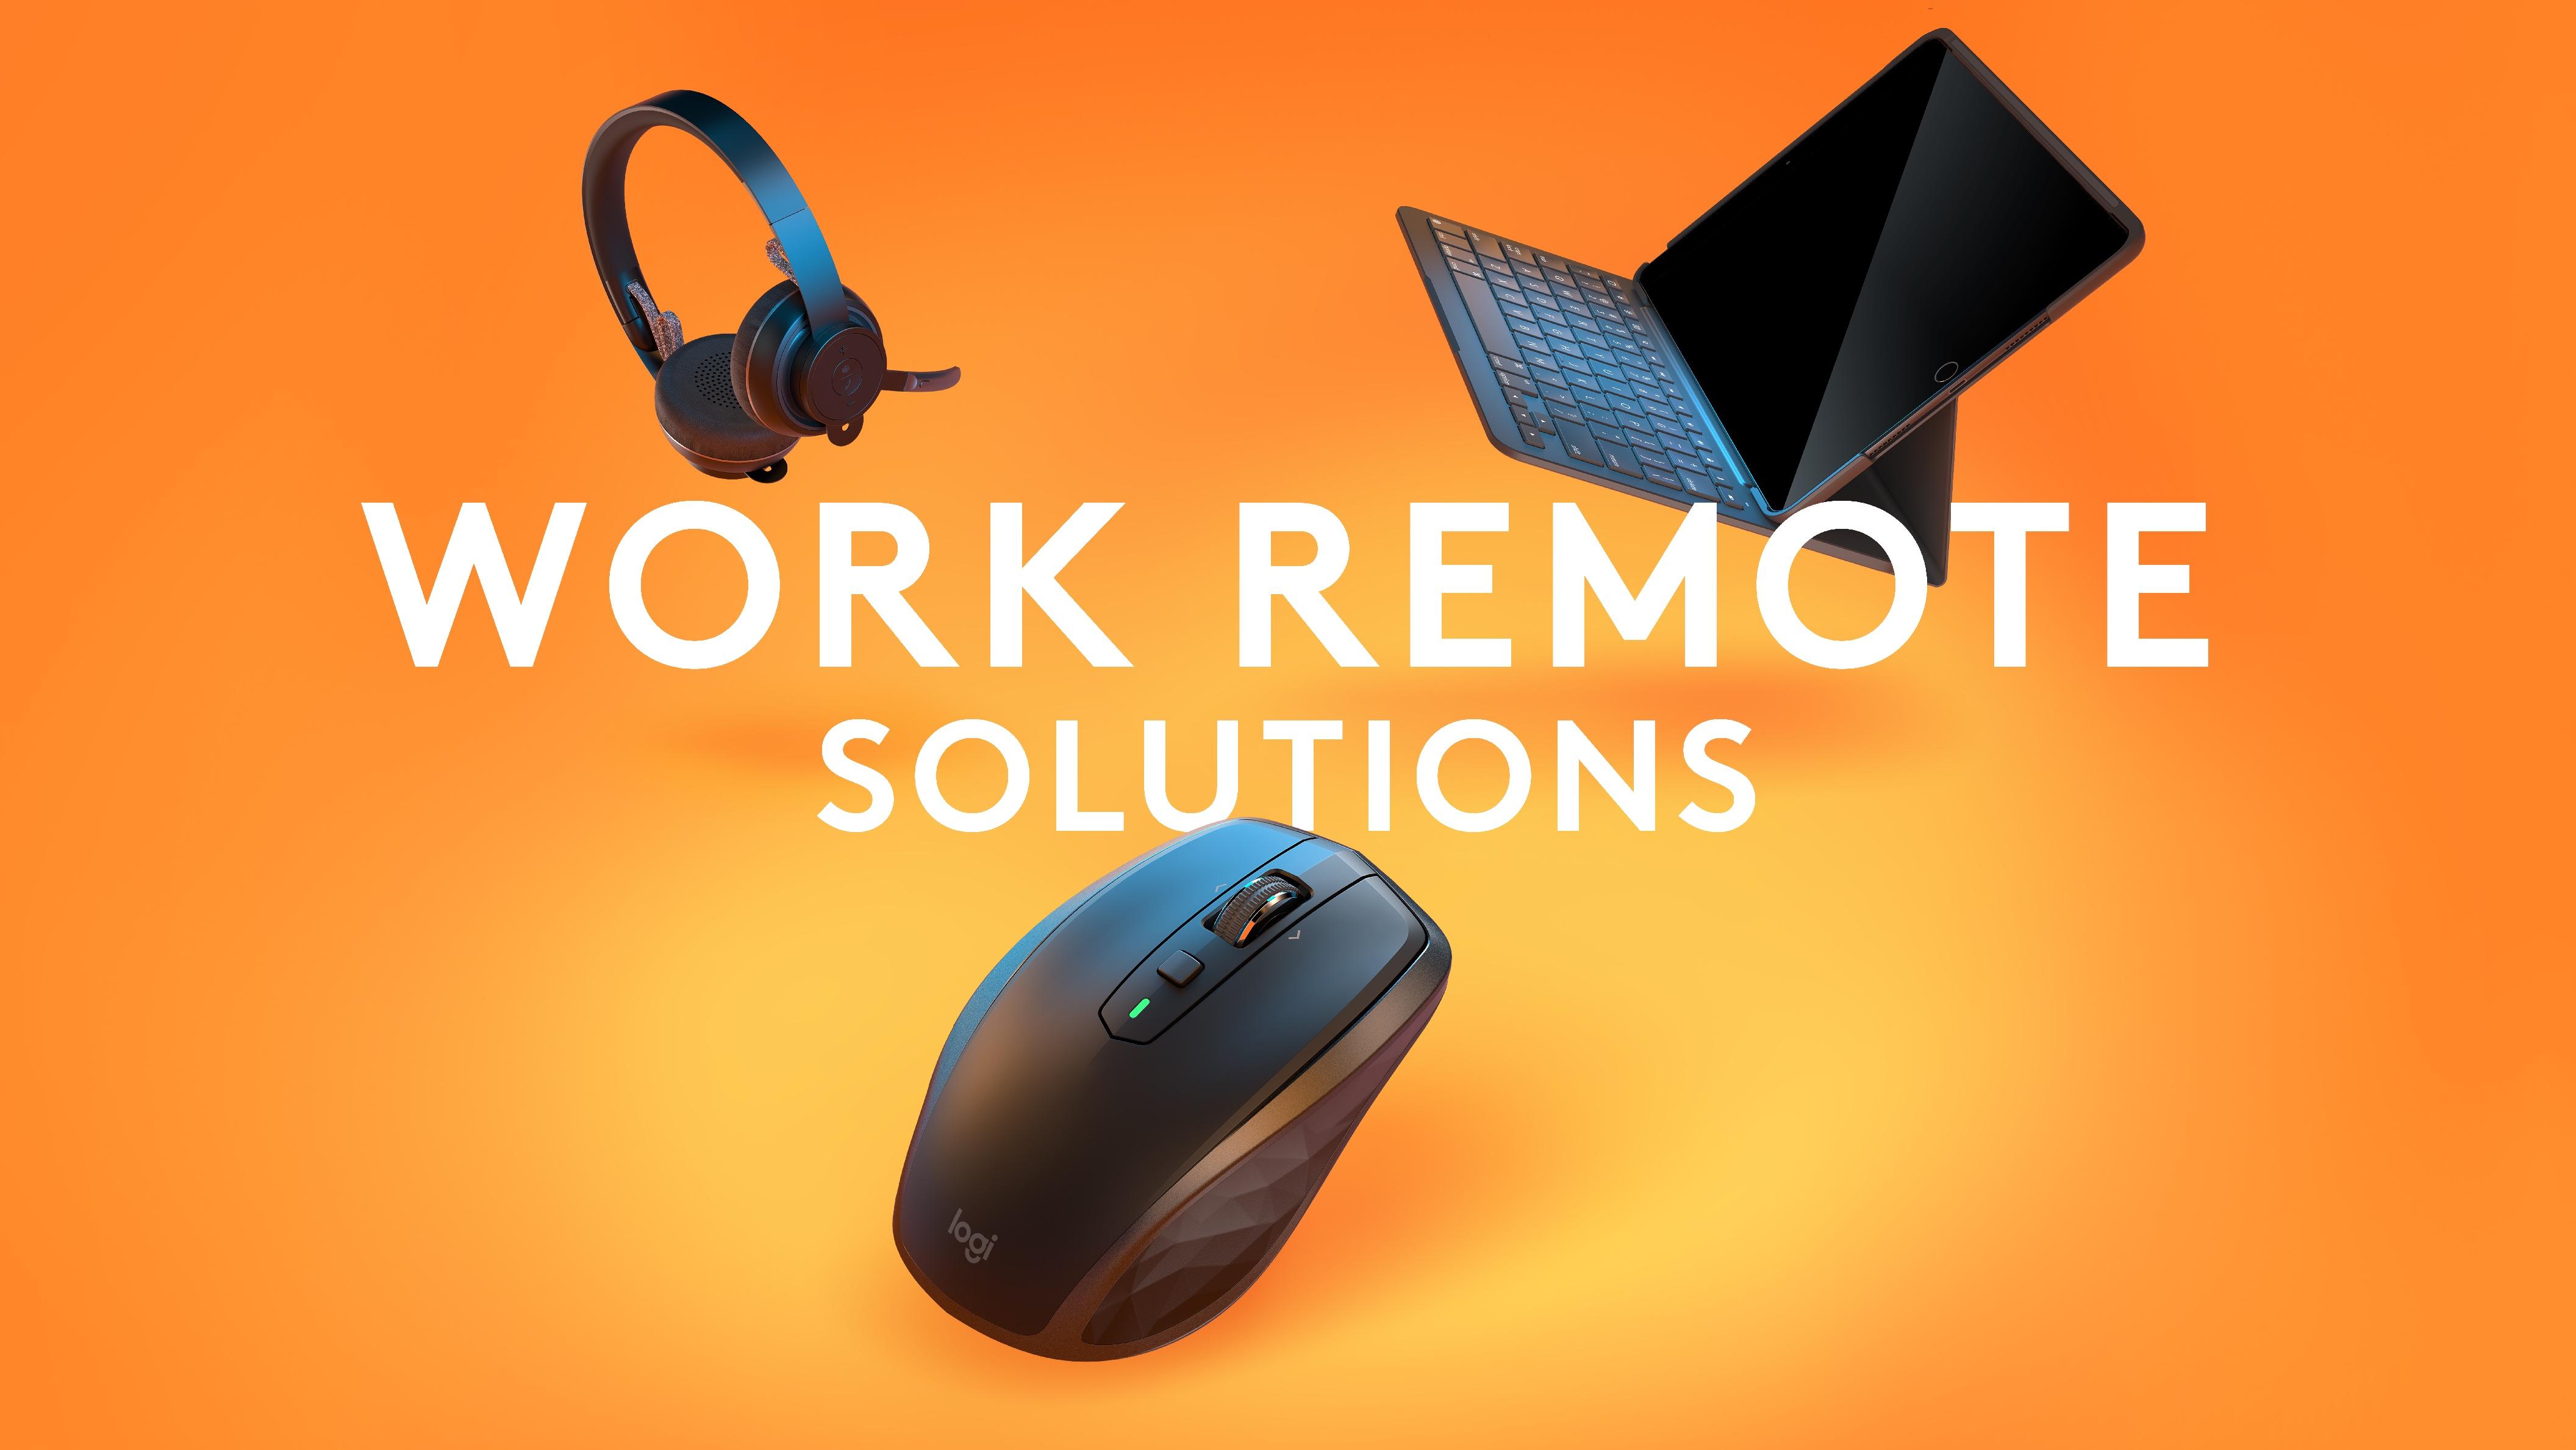 Logitech Arkphire Remote Wins-1